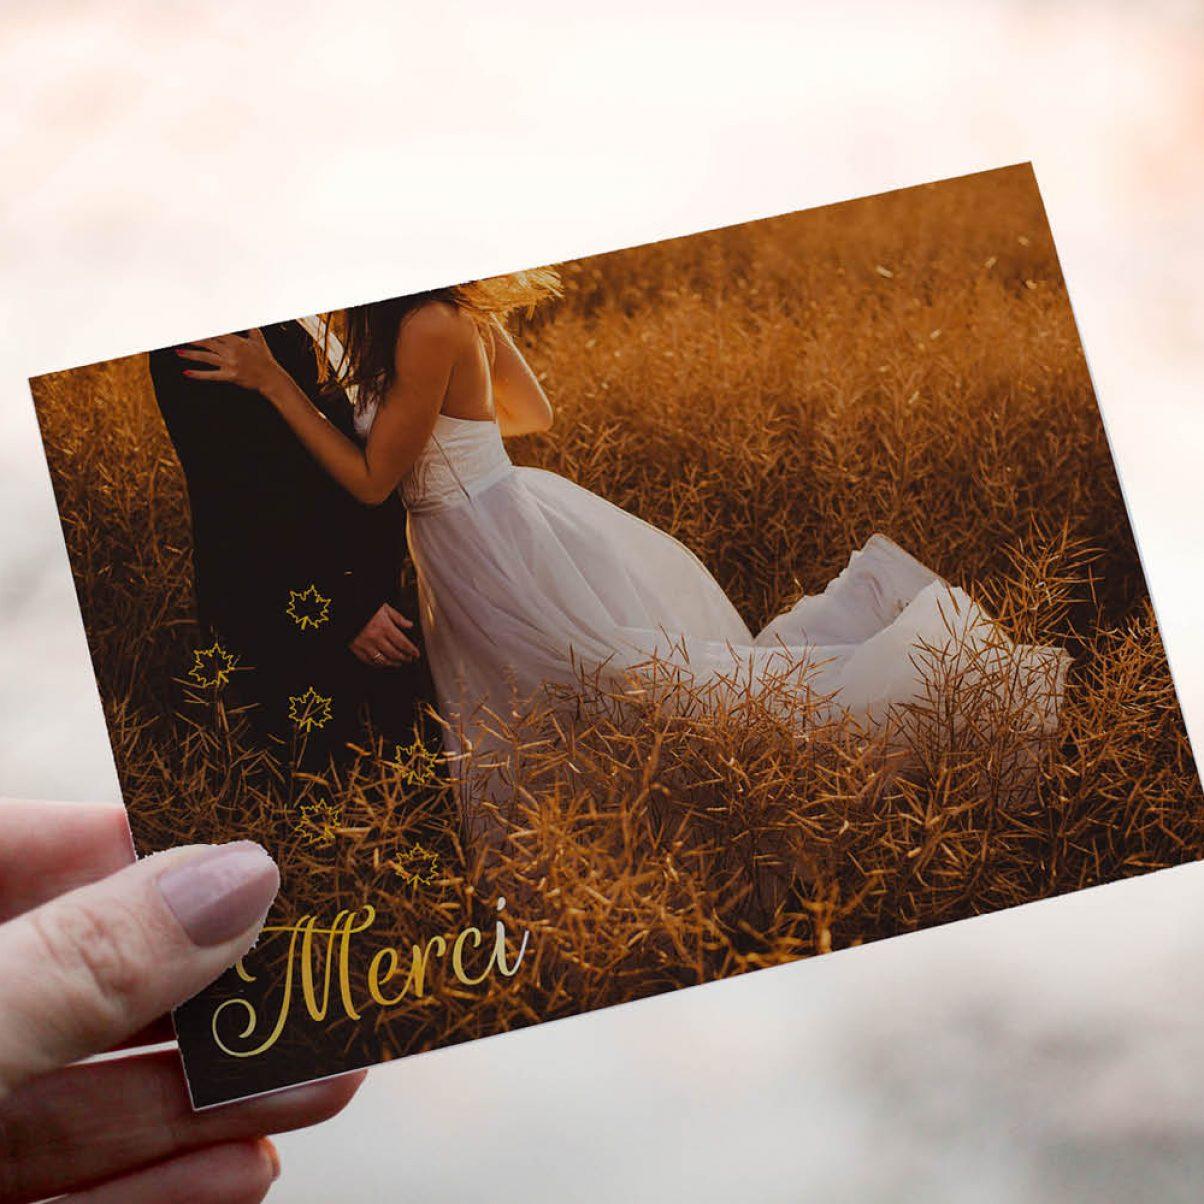 Le carton de remerciements du mariage de Claire & Lucas - recto